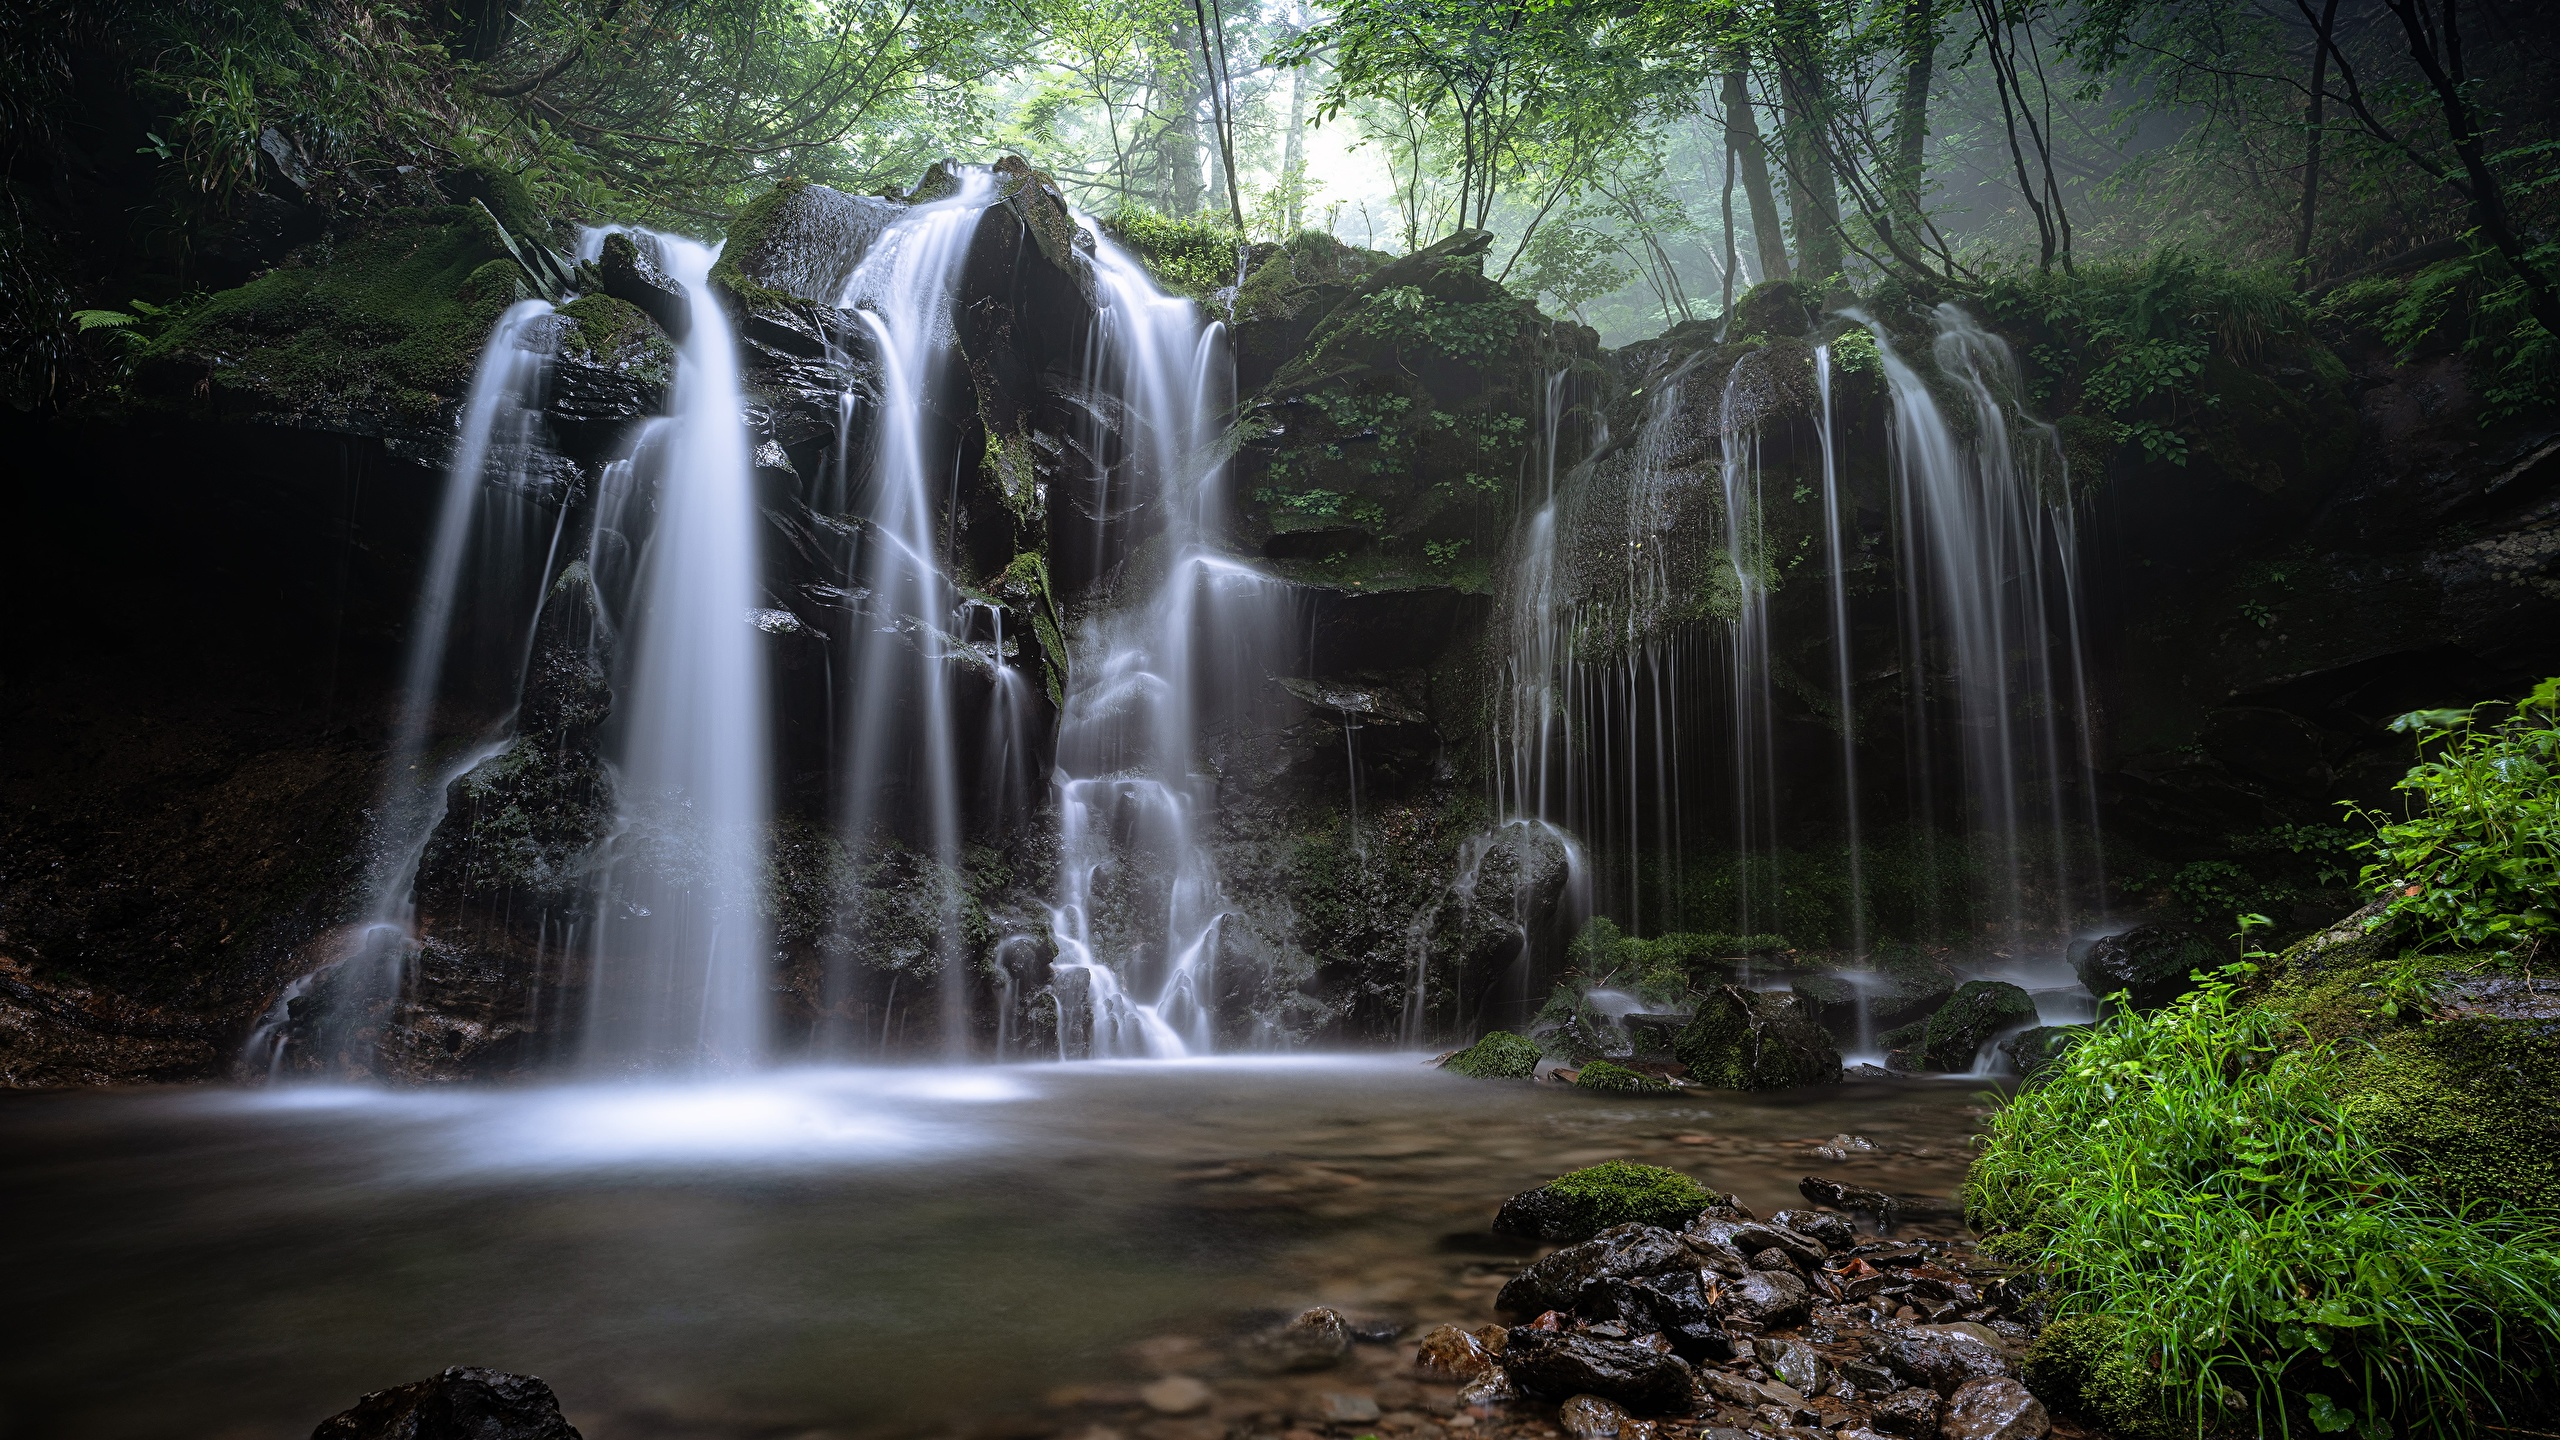 Photos Nature Waterfalls Moss Grass Stones 2560x1440 stone